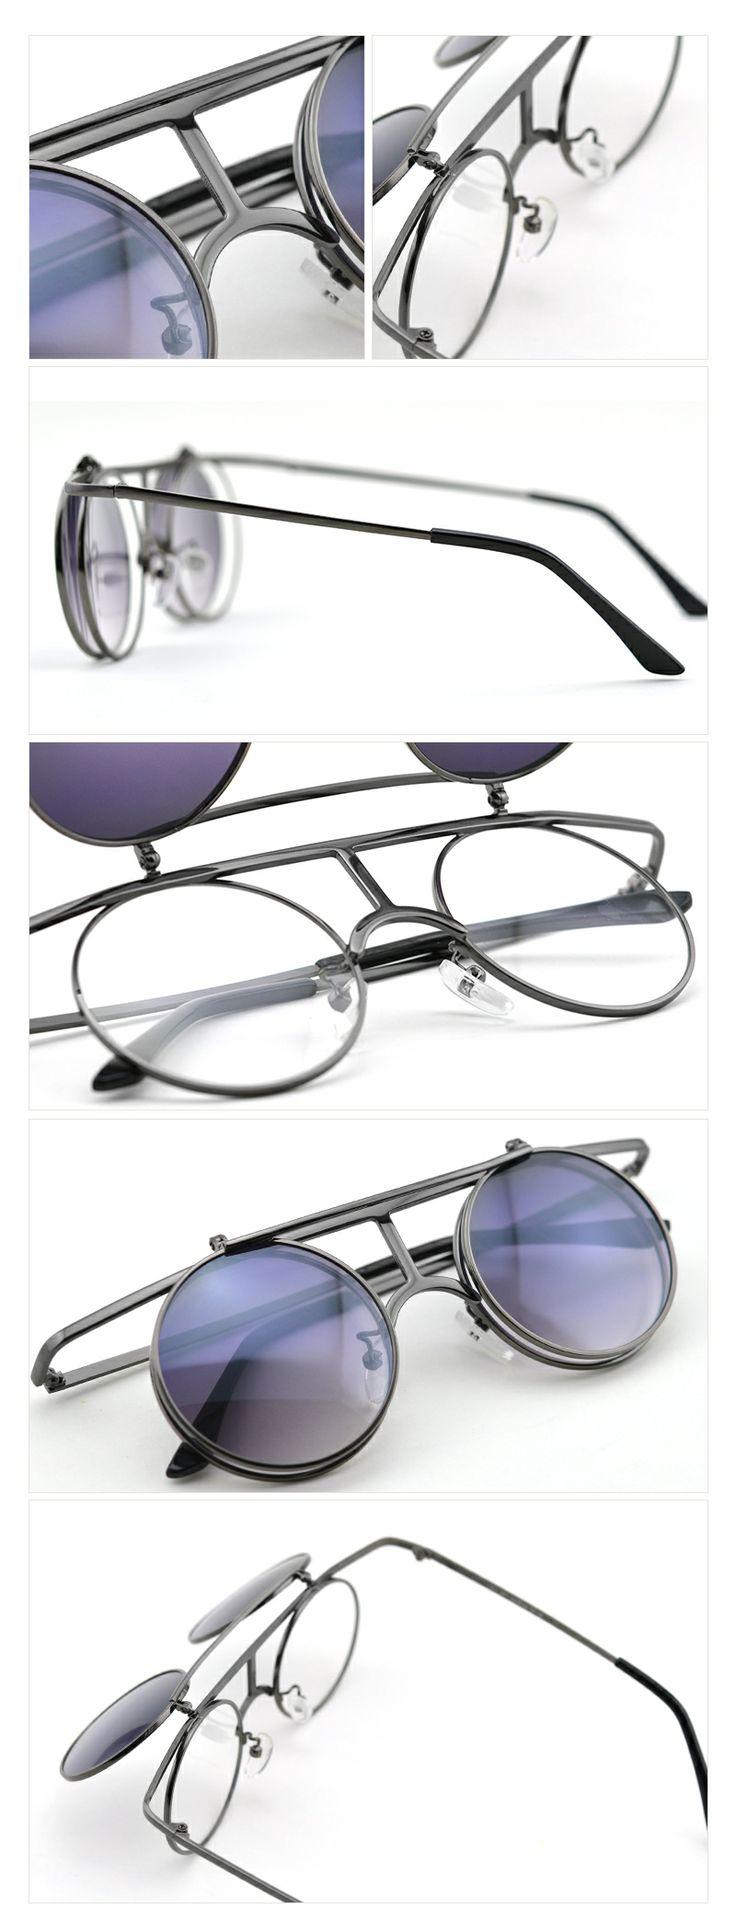 #Steam Punk flip style sunglasses retro style sunglasses suit your face sunglasses Black lens #Choose cool sunglasses -- Visit FUNMEMO.COM